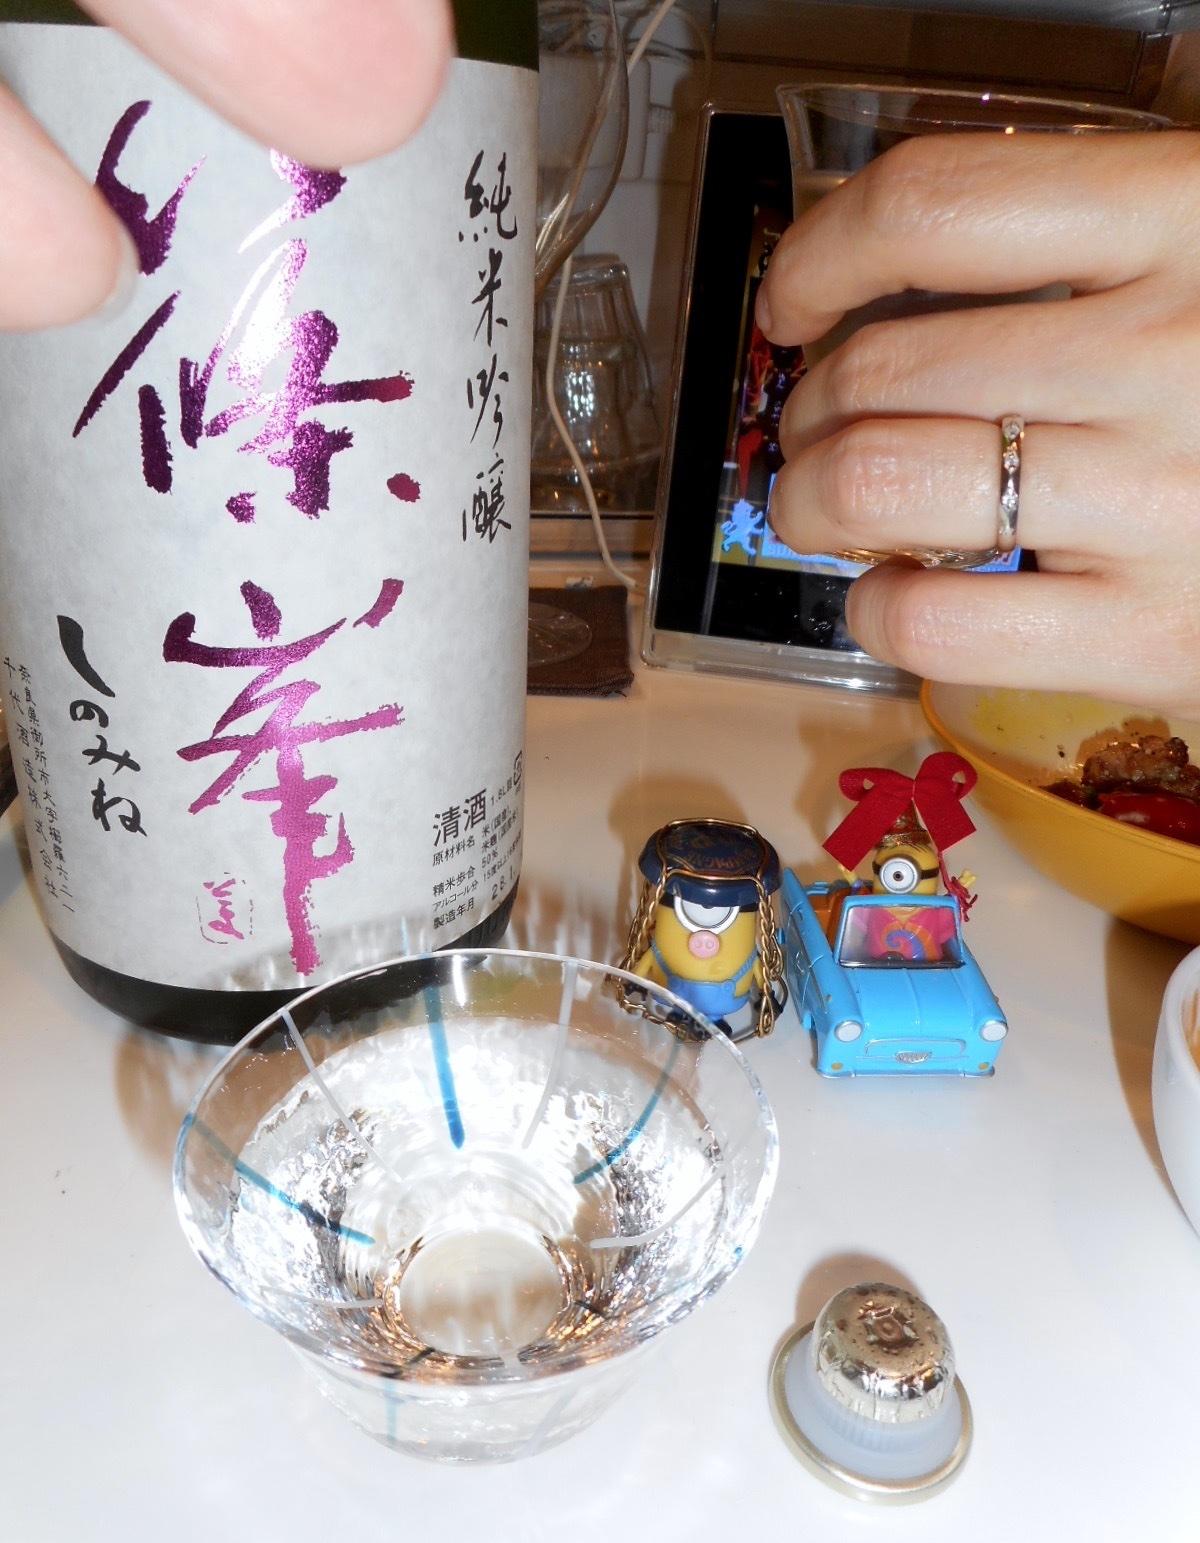 shinomine_oyamanishiki27by6.jpg